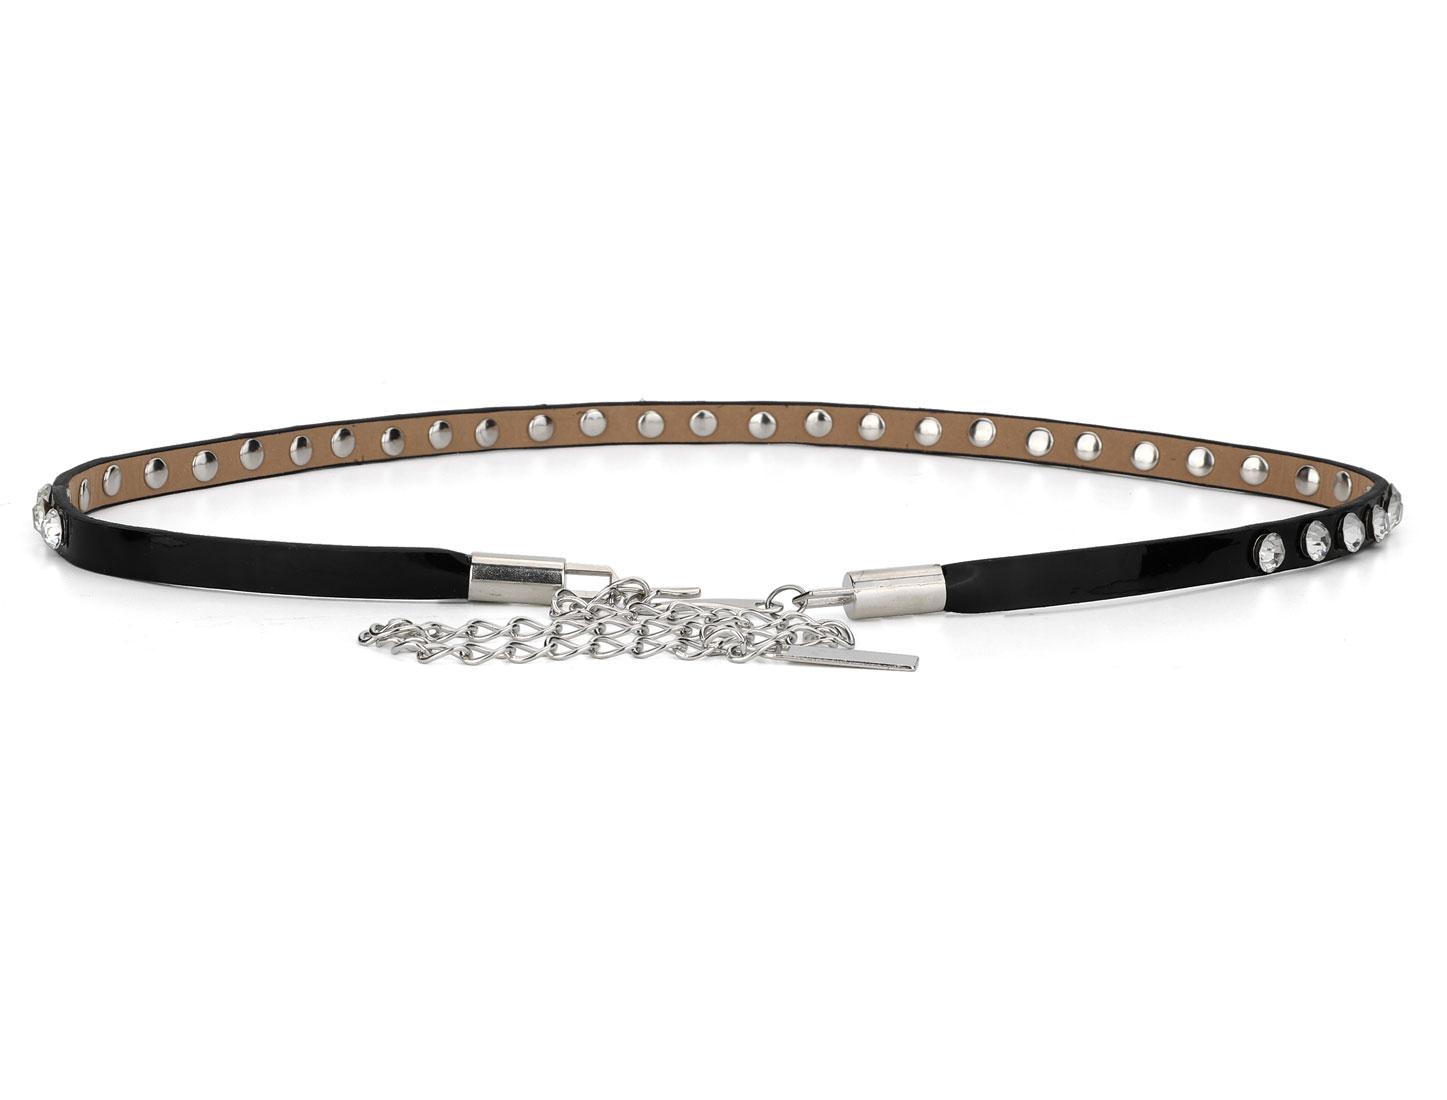 Women Plastic Crystal Decor Black Faux Leather Slim Belt w Chain